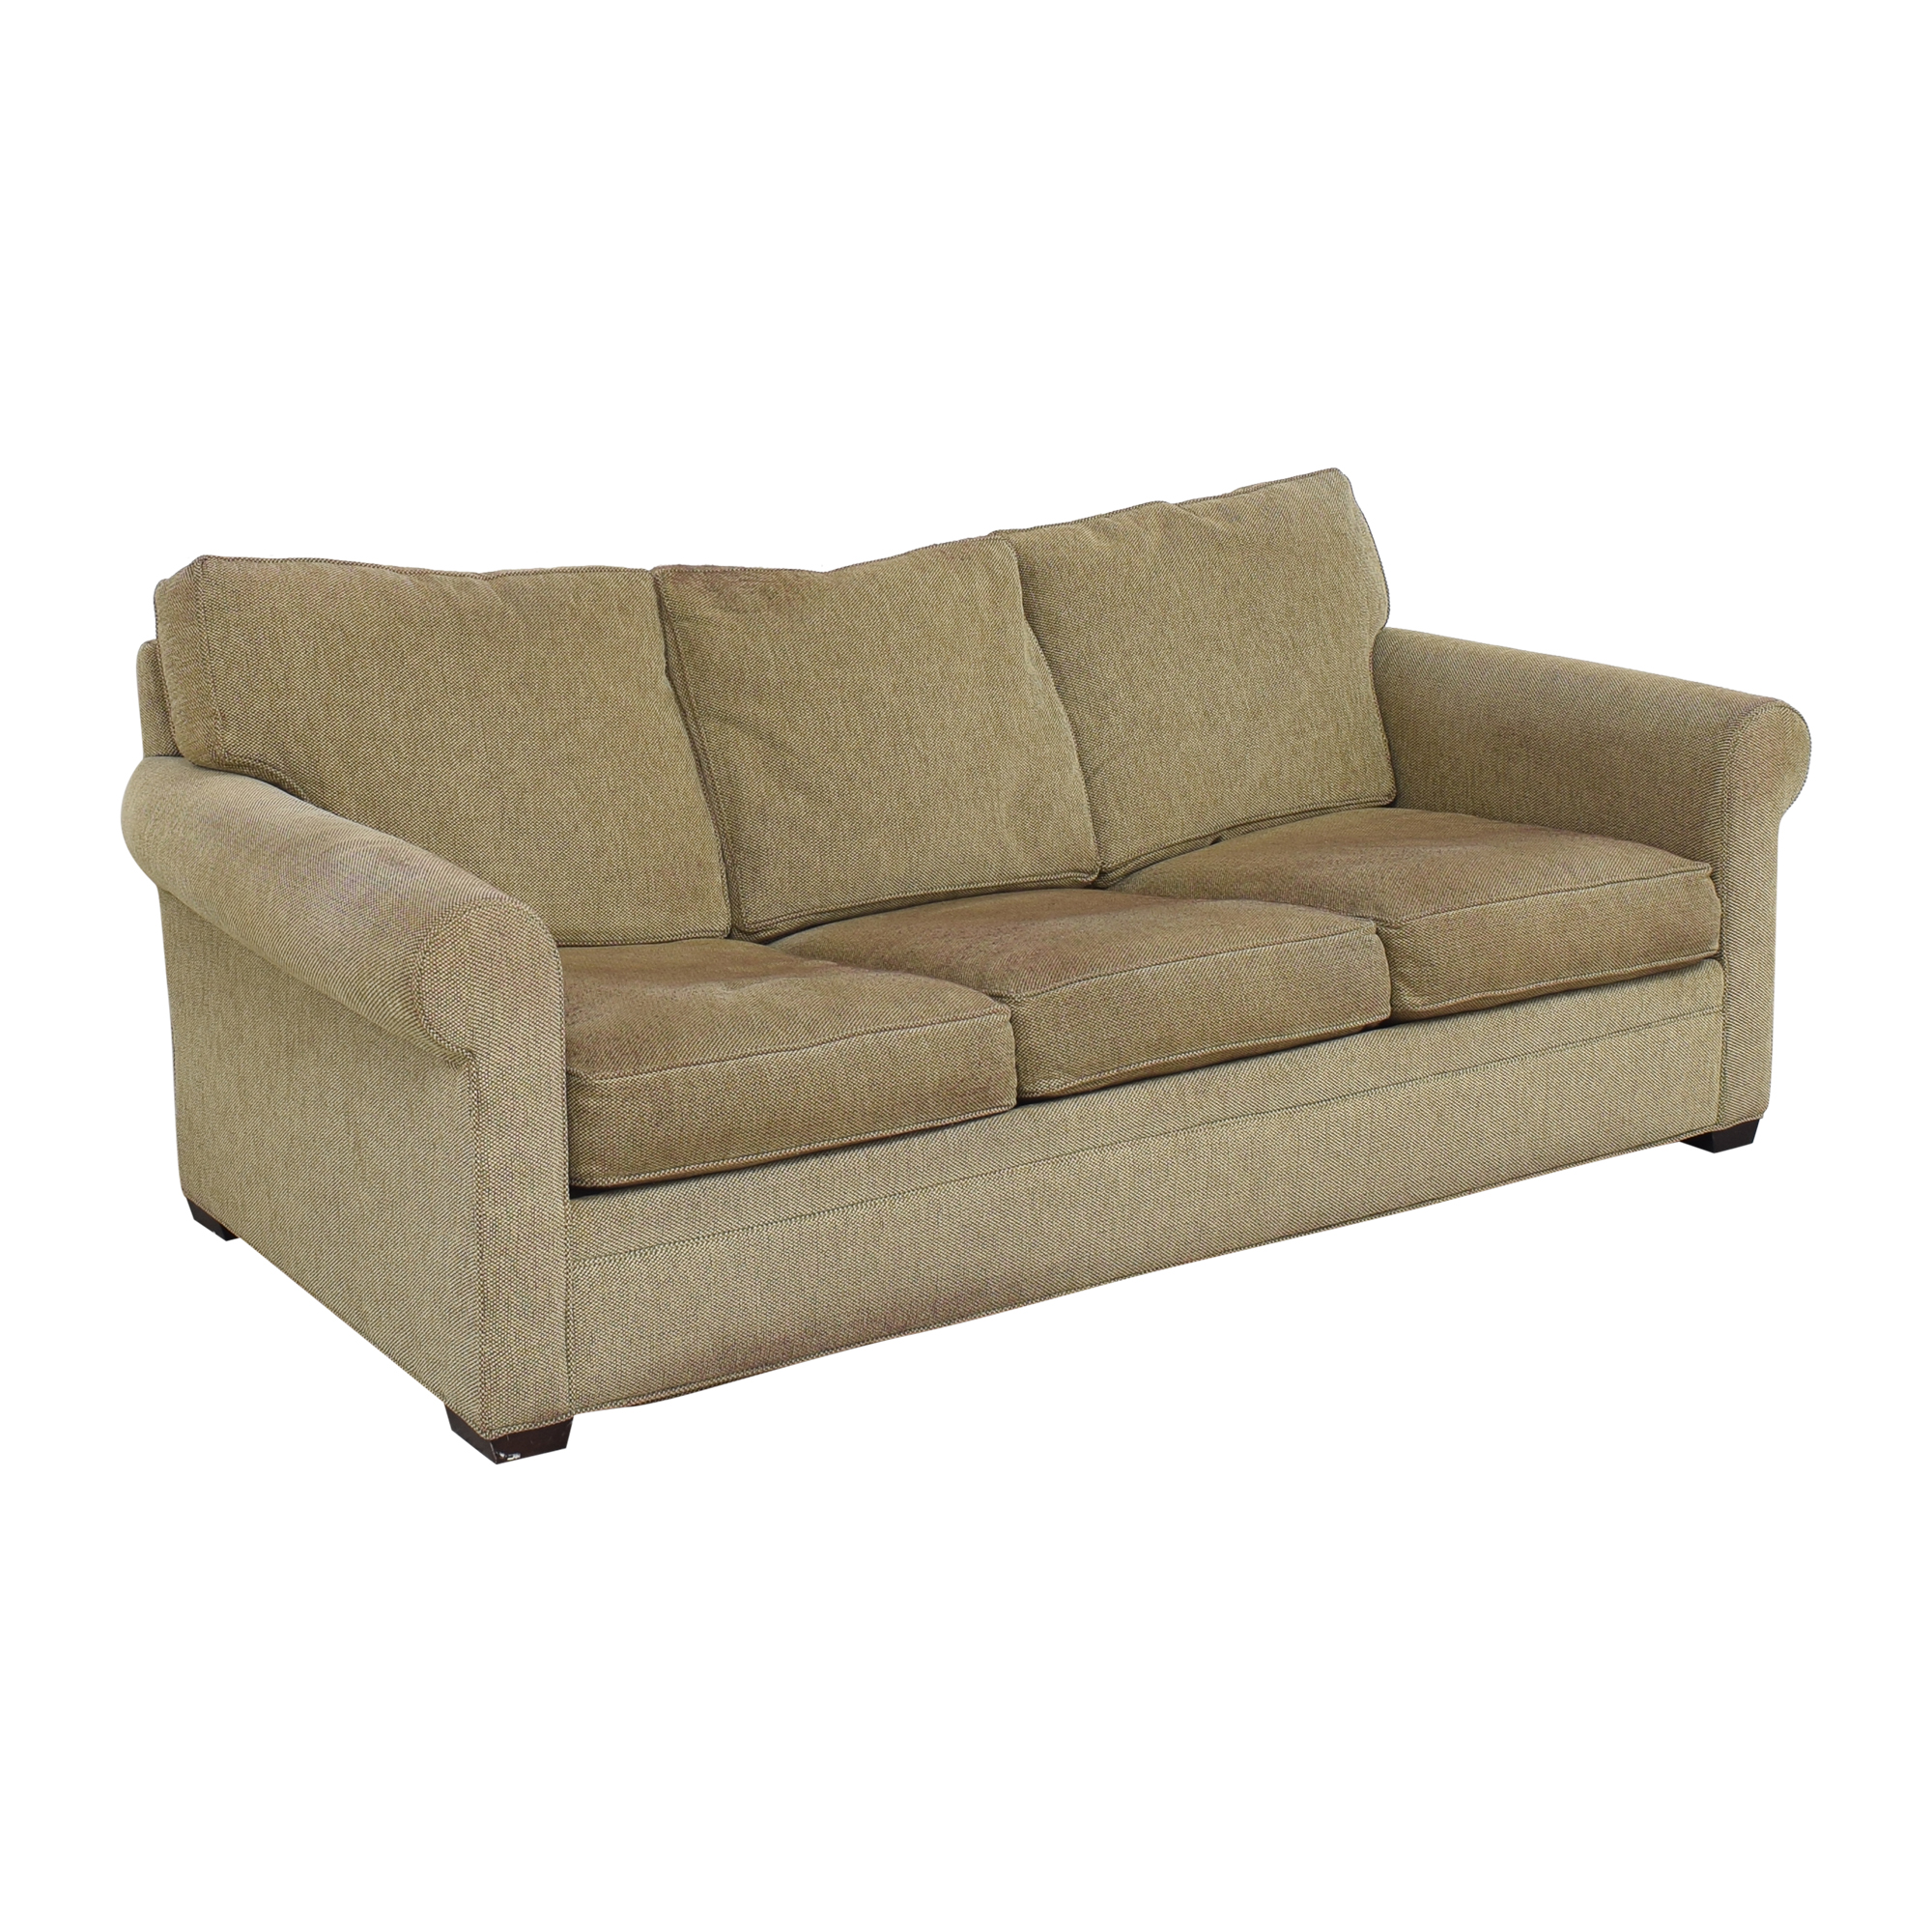 Crate & Barrel Crate & Barrel Three Cushion Sleeper Sofa